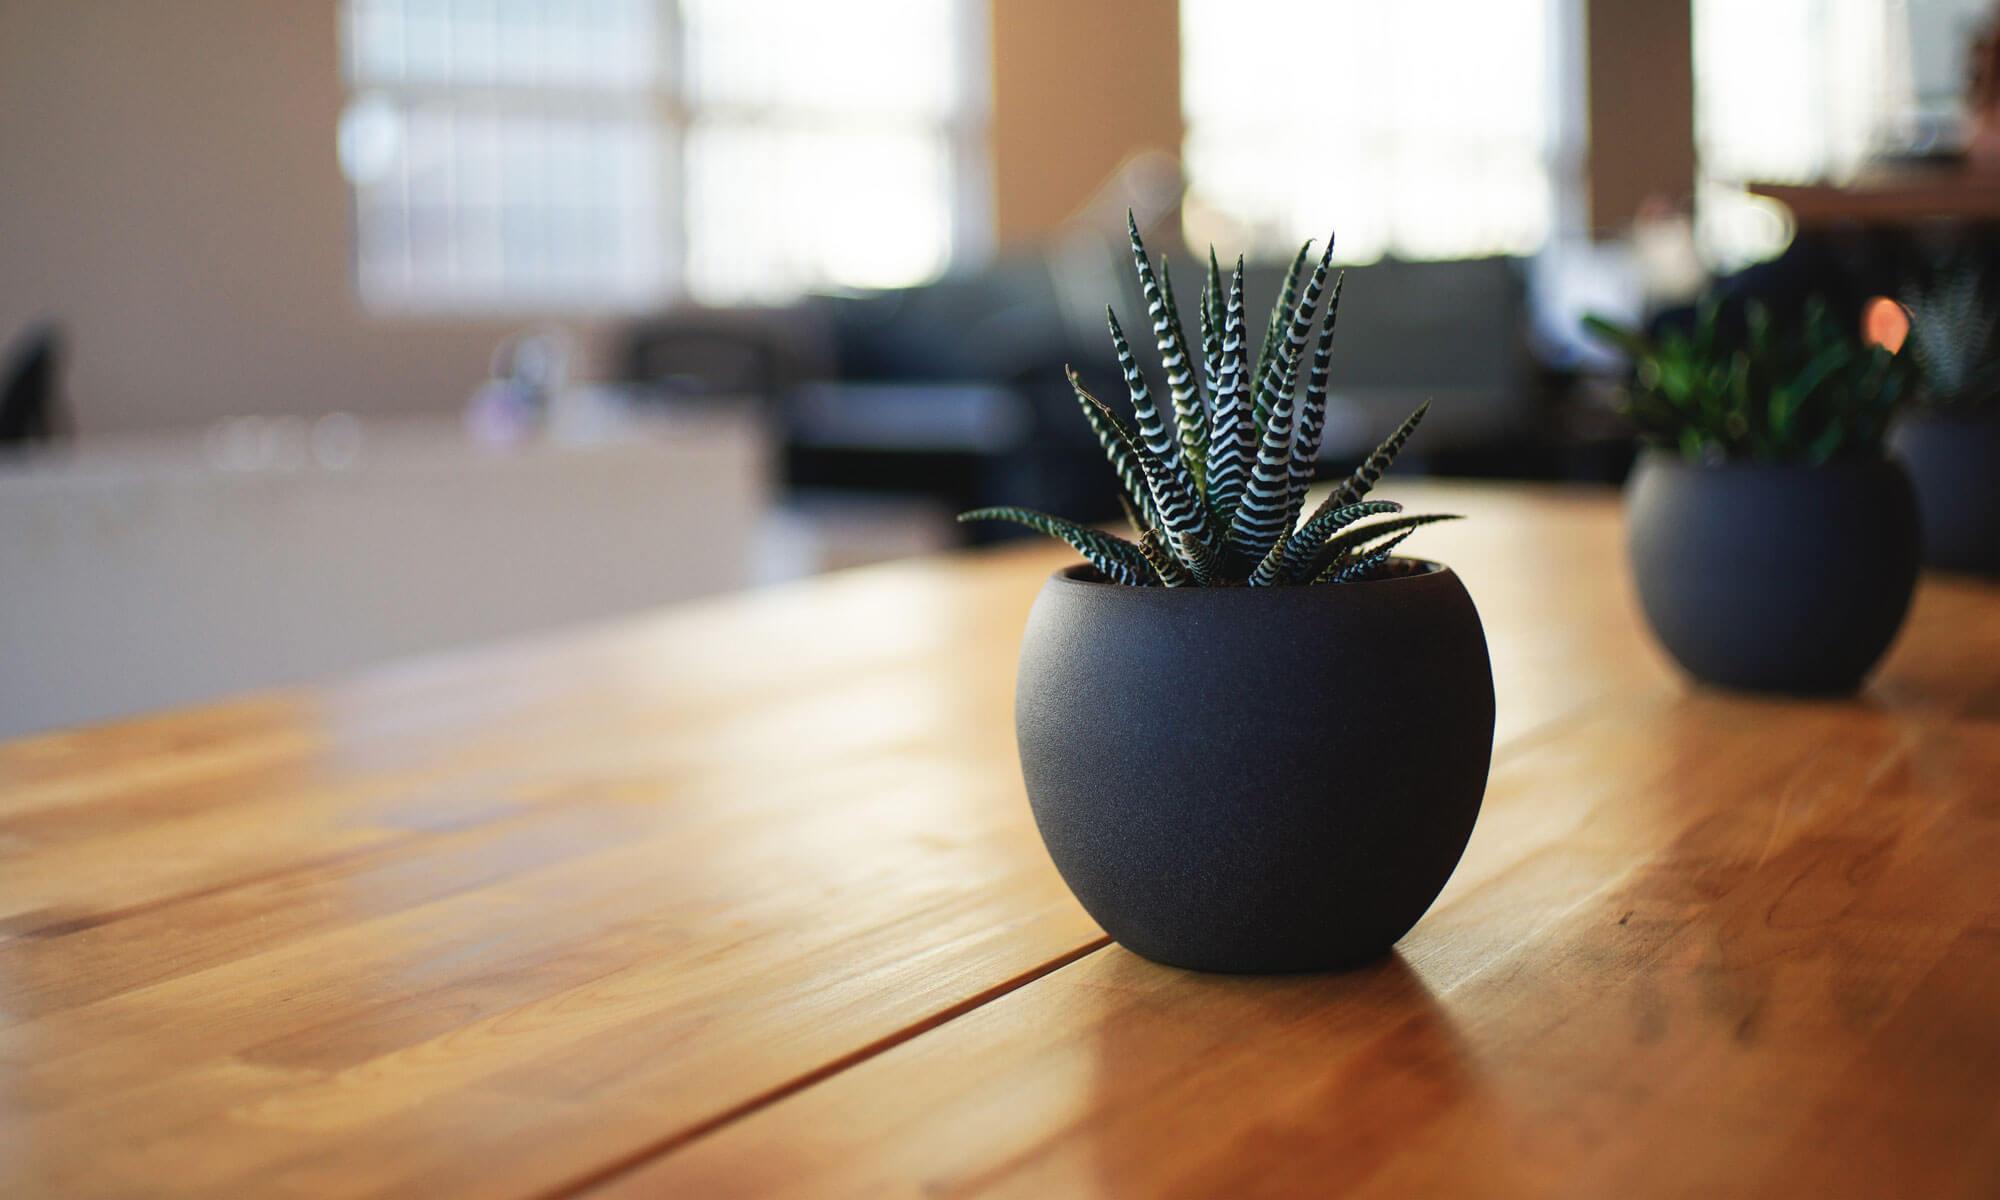 Atilia - Hanfpflanzen